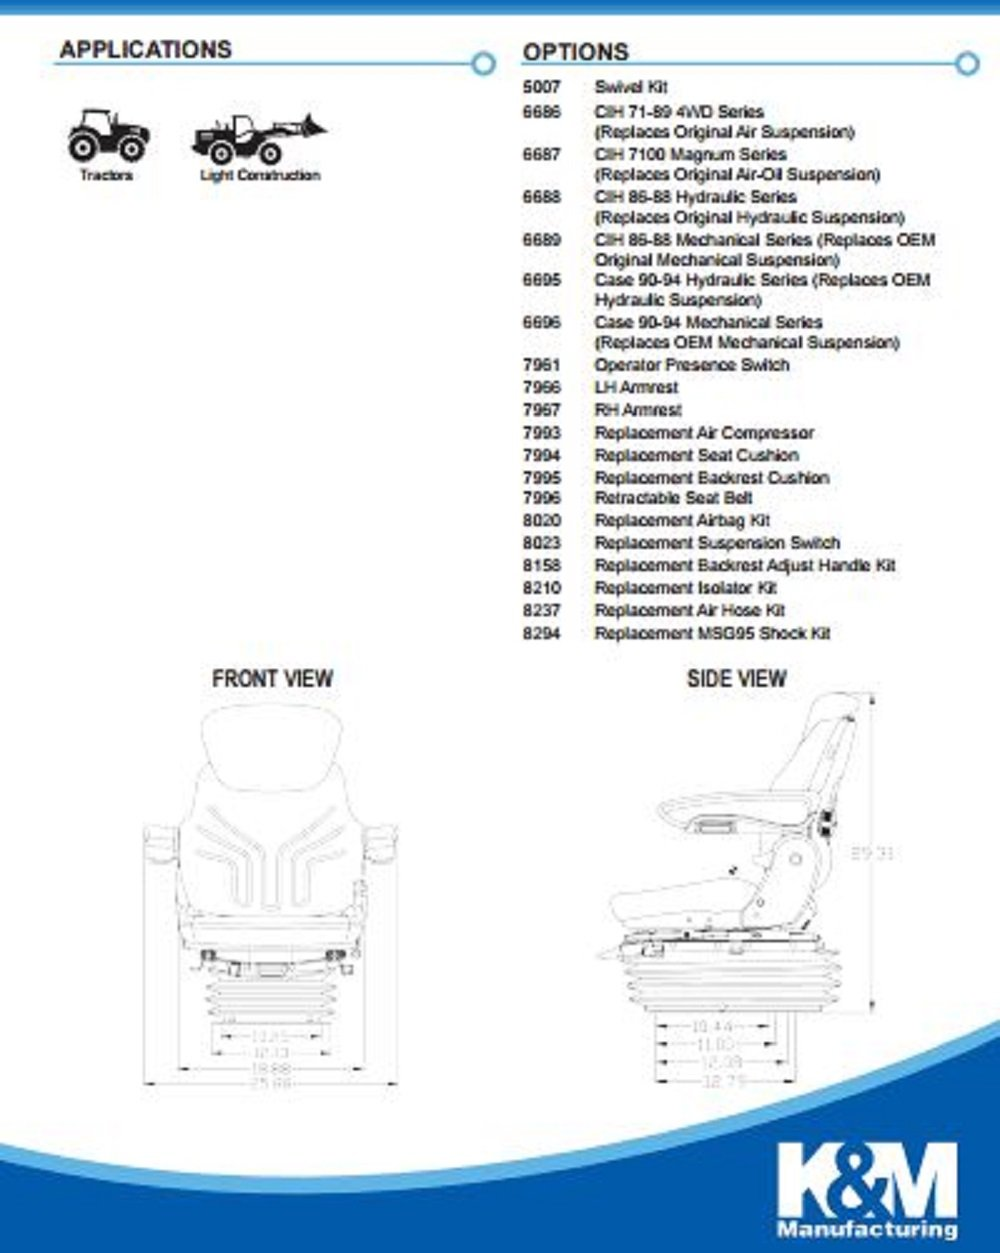 Km 1055 Uni Pro Seat And Suspension Rollers Wheel John Deere 8410 Wiring Diagram Case Ih Deutz Allis Ford New Holland Kubota Massey Ferguson Mccormick White Caterpillar Industrial Scientific